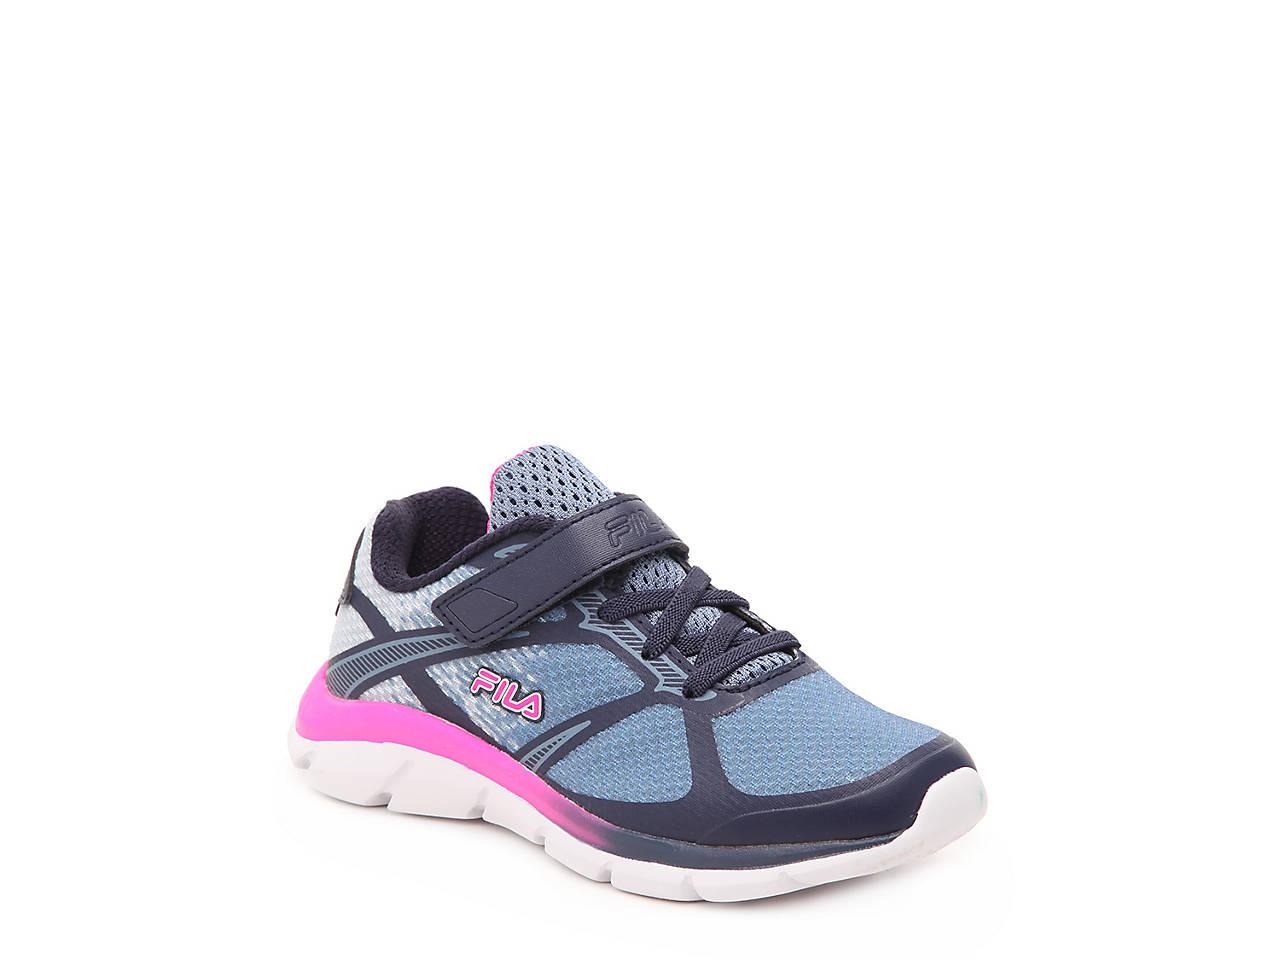 Primeforce 3 Sneaker Kids'